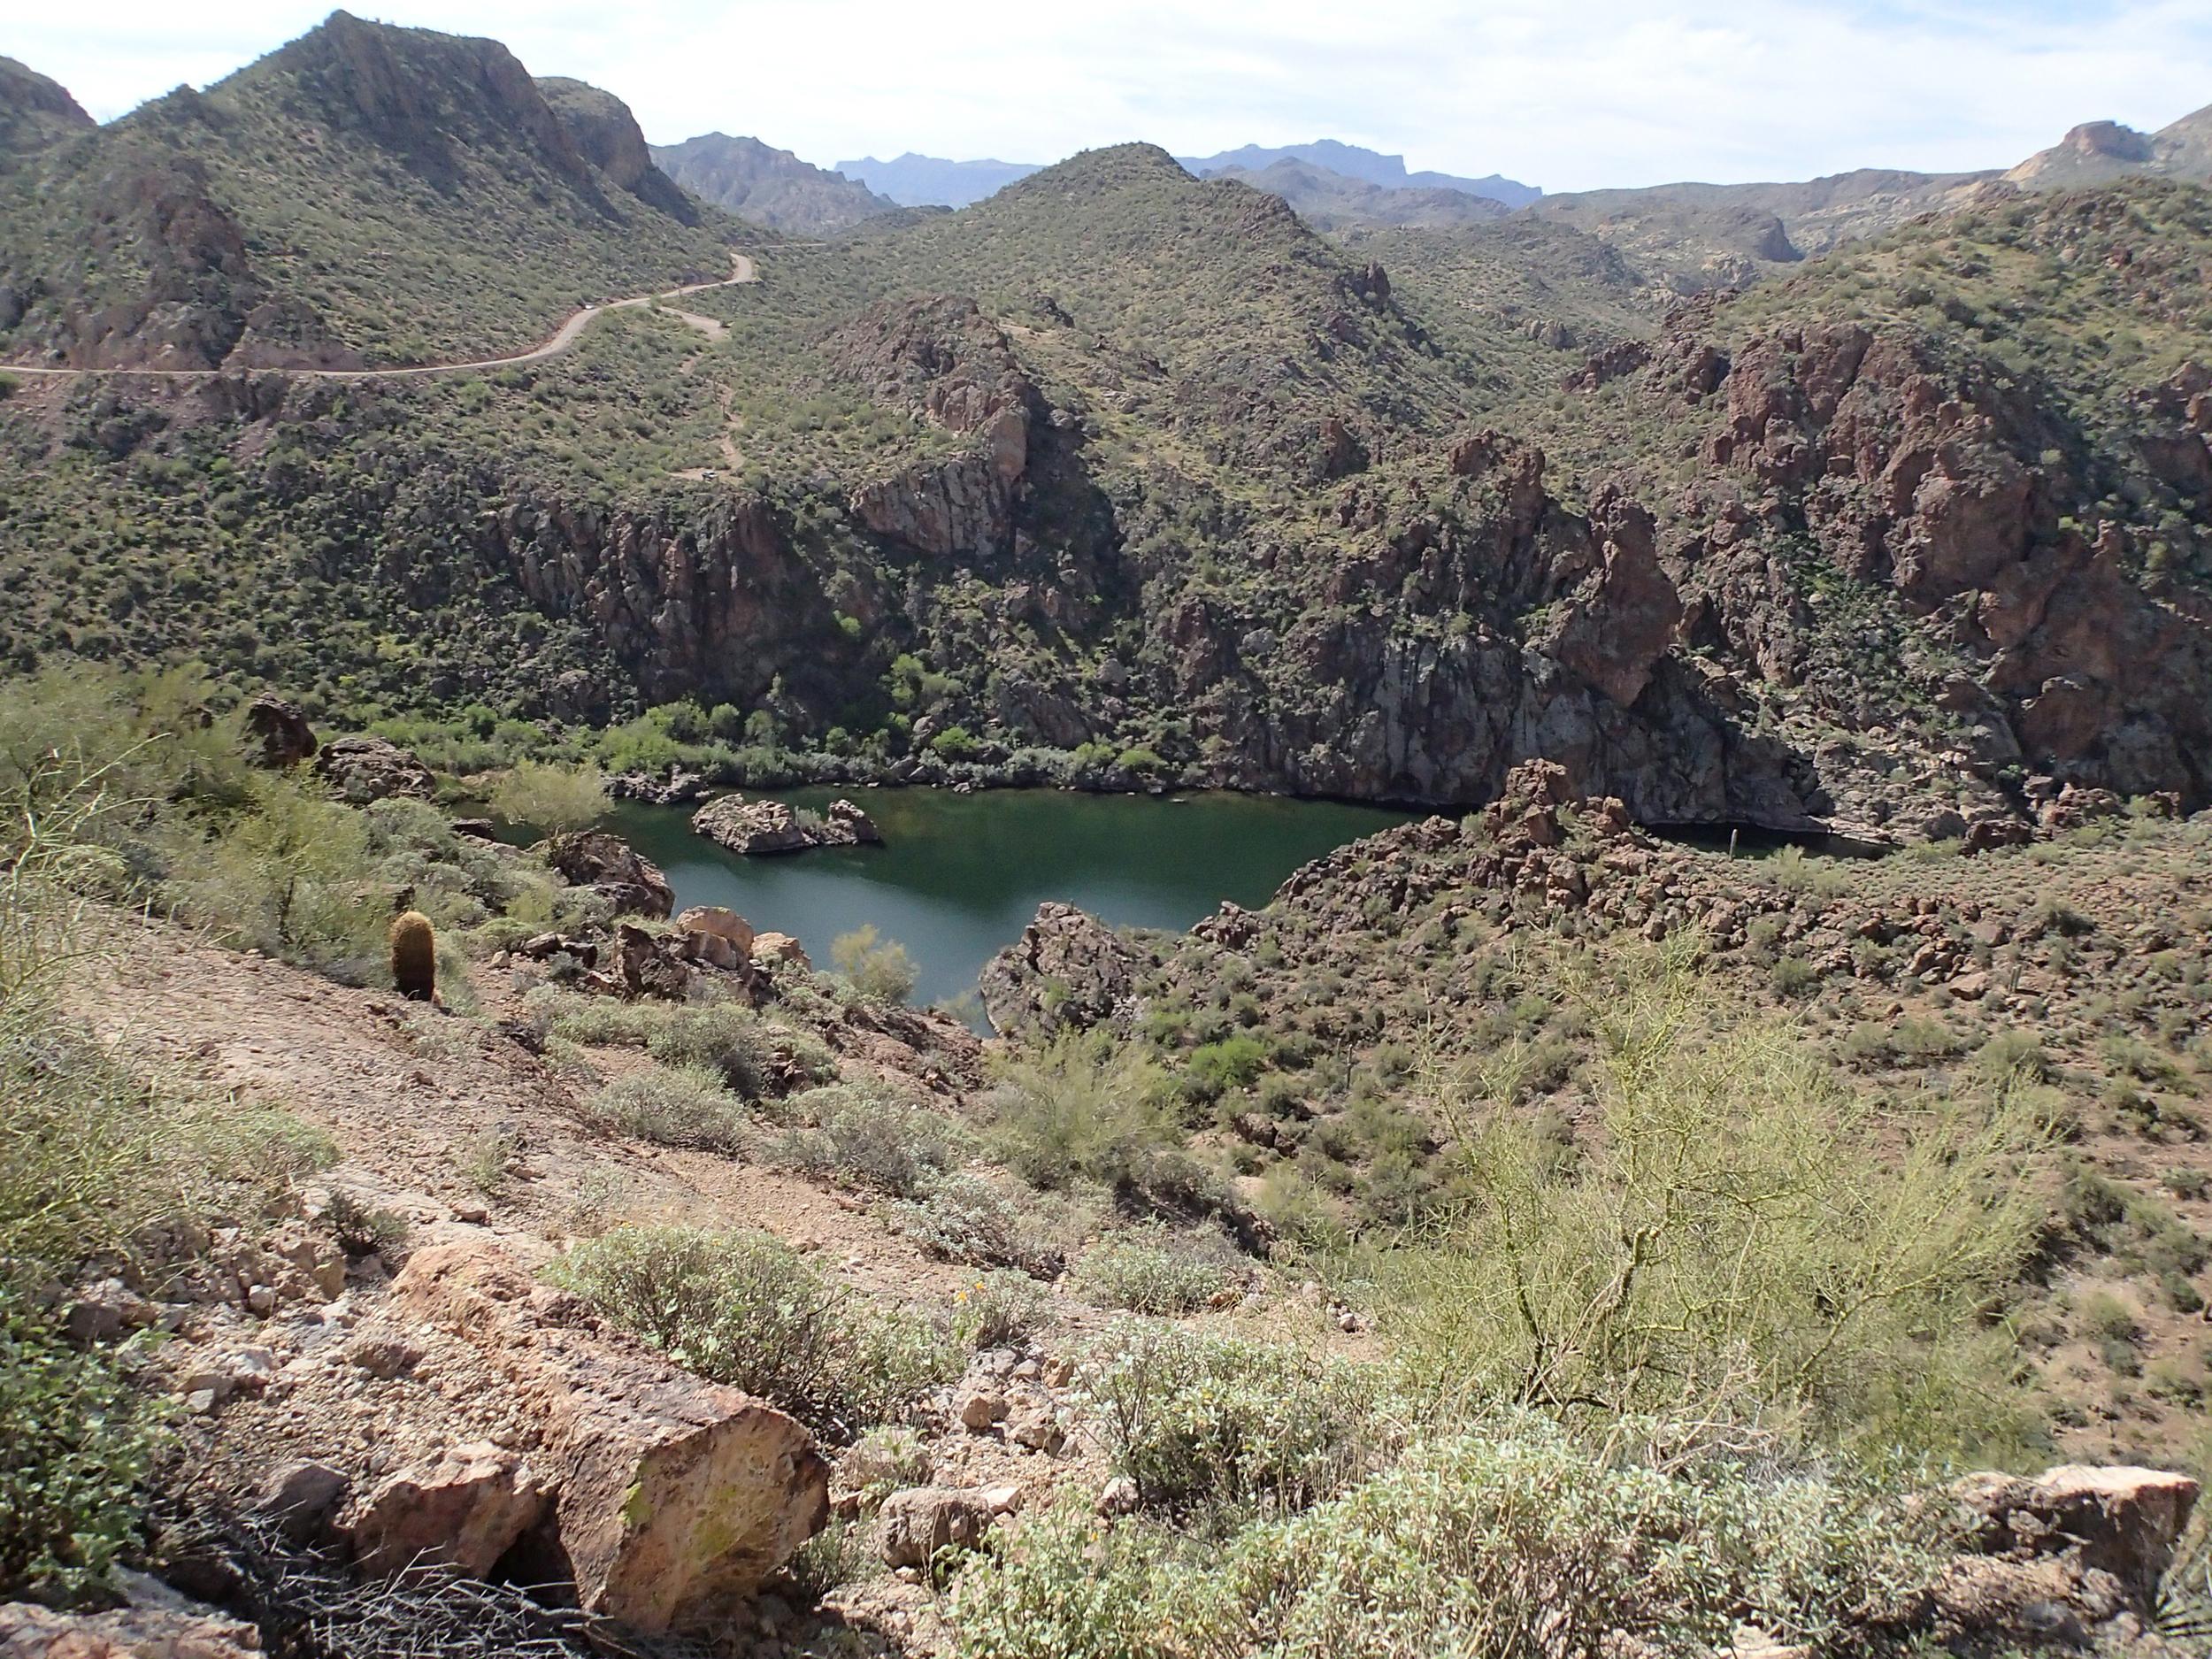 Splash Down Canyon - Canyoneering, AZ